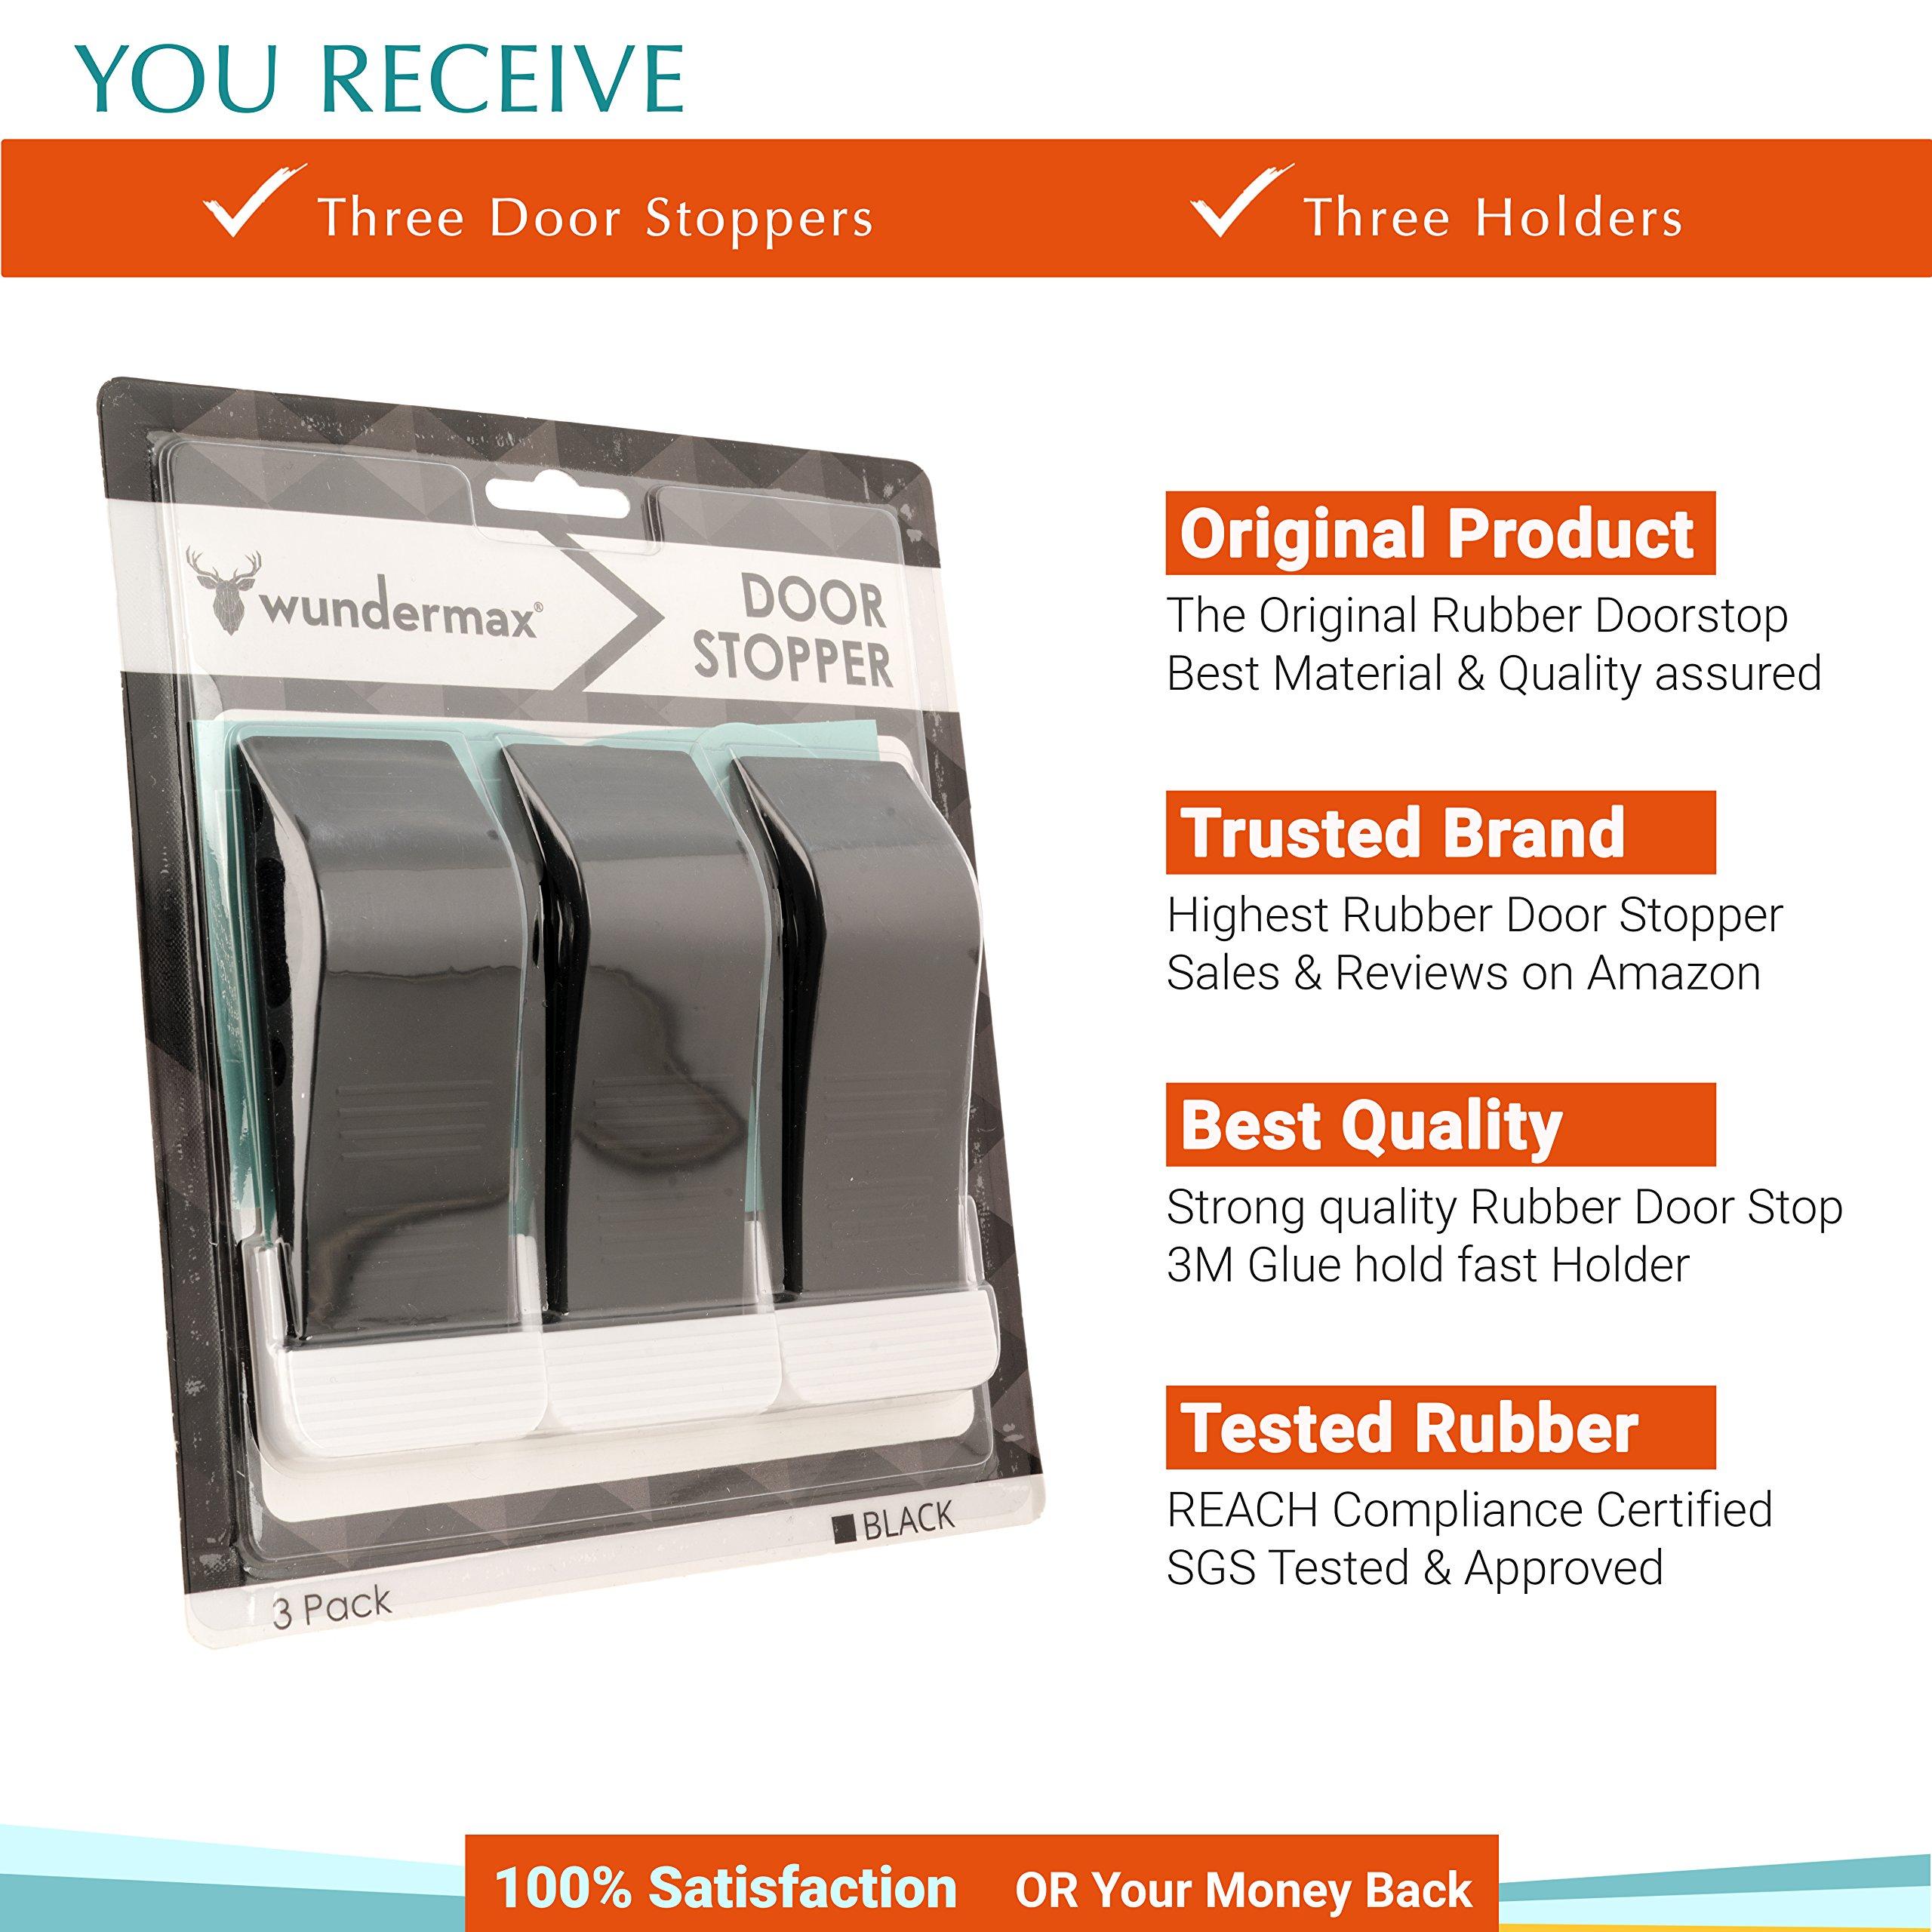 Wundermax Decorative Door Stopper with Free Bonus Holders, Door Stop Works on All Floor Surfaces, Premium Rubber Door Stops, The Original (3 Pack, Black) by Wundermax (Image #2)